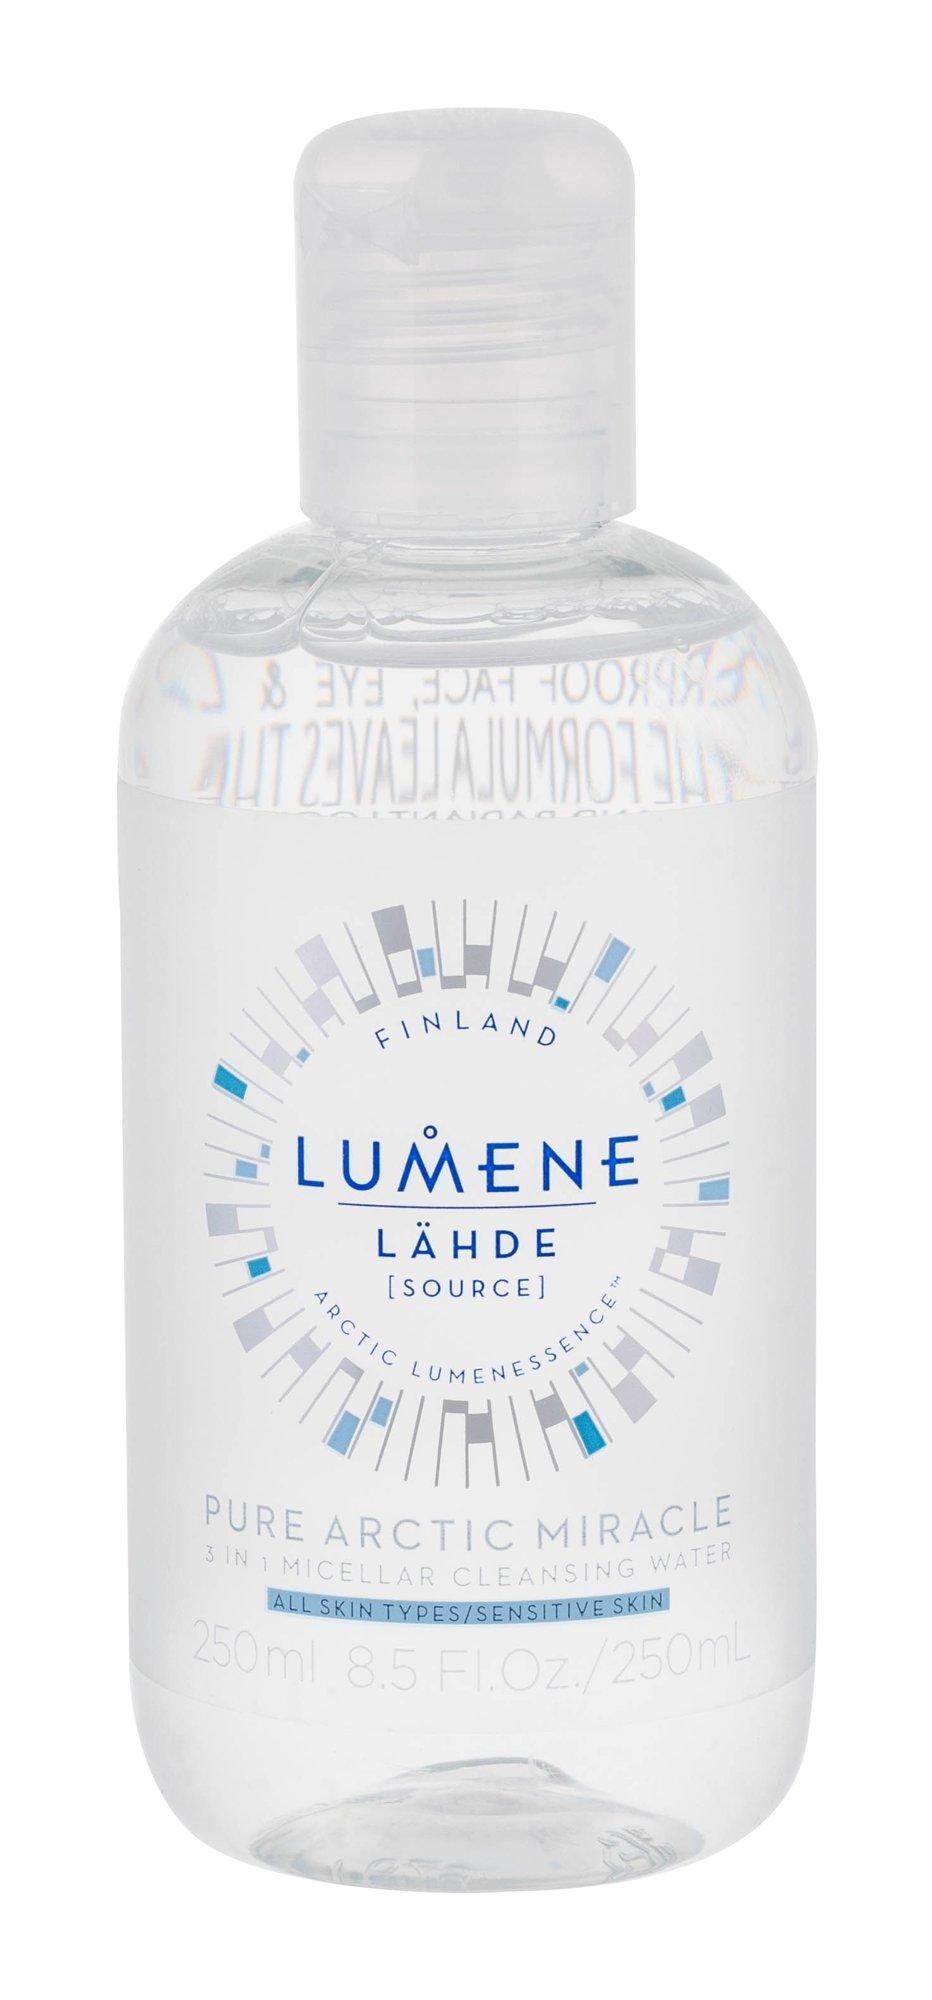 Lumene Lahde Micellar Water 250ml